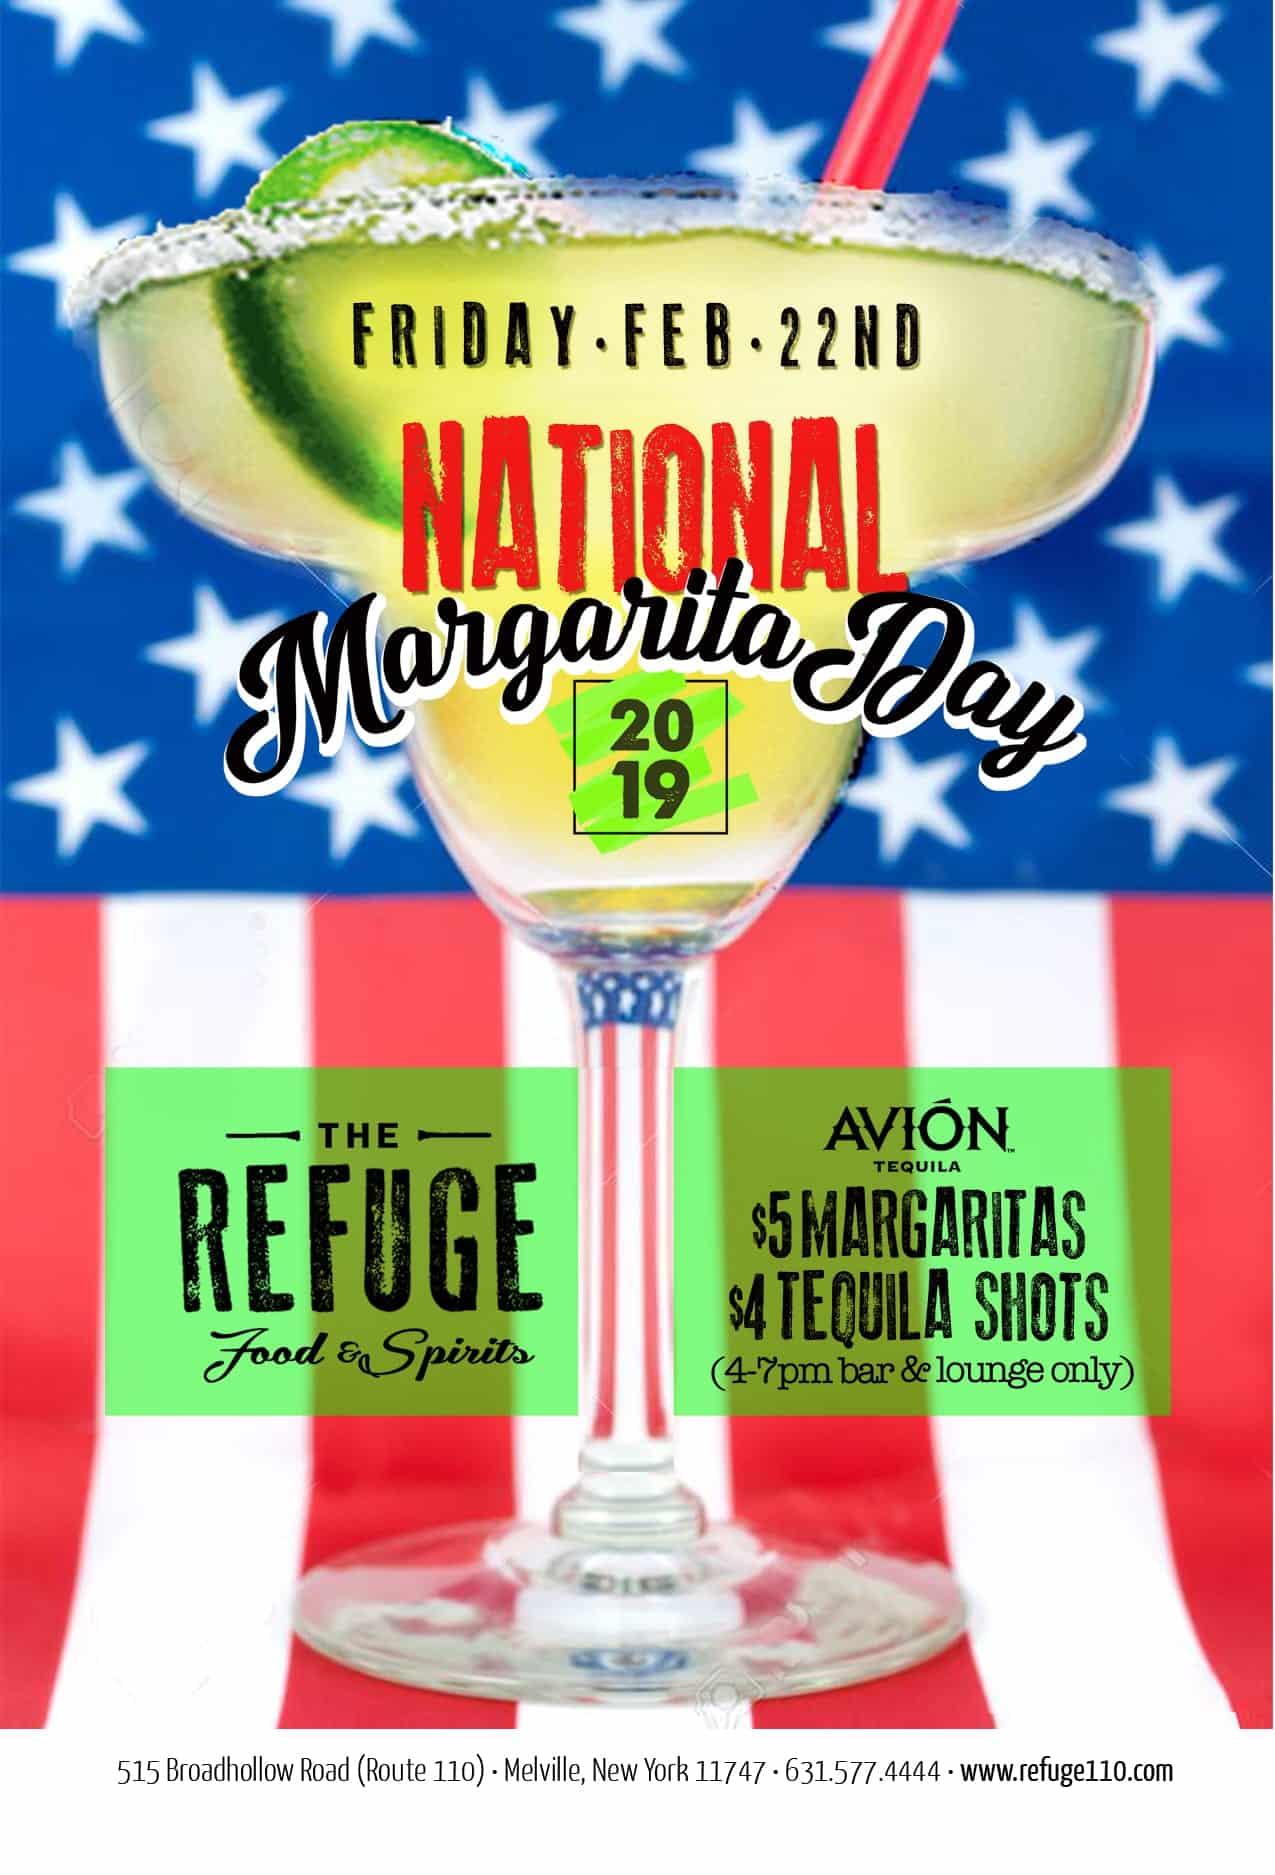 National Margarita Day - The Refuge